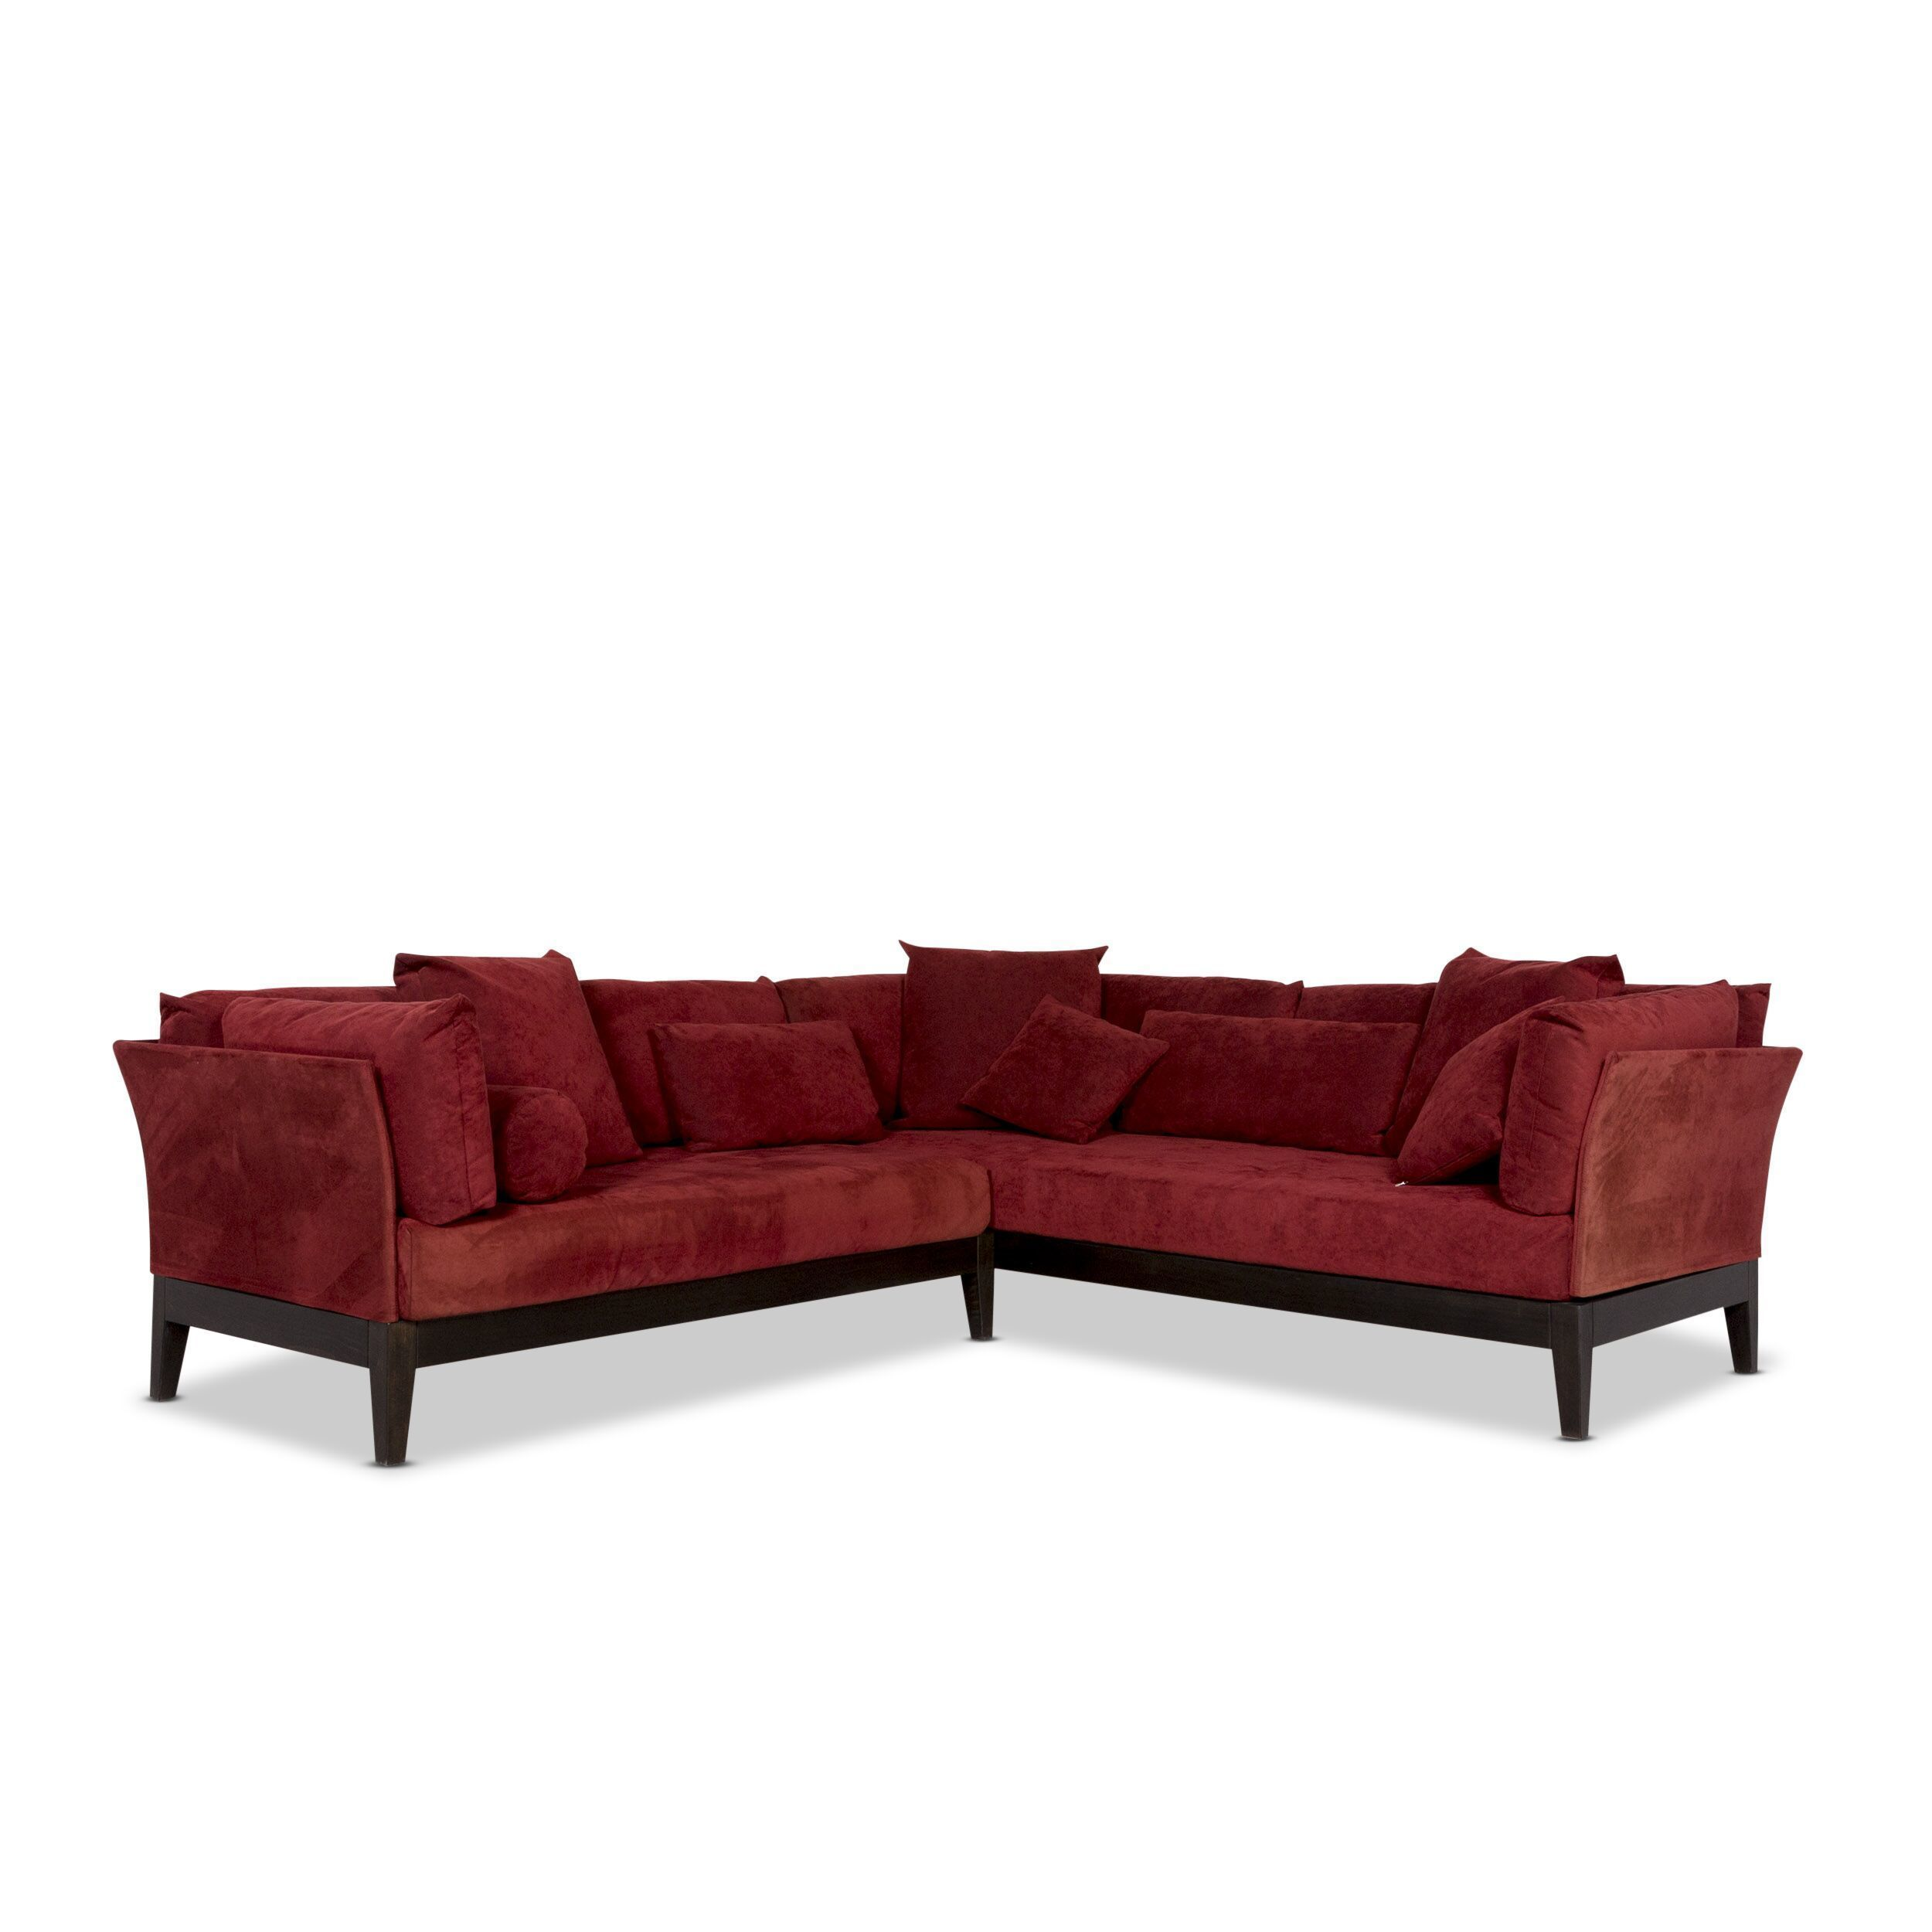 Seefelder Bonna Leder Microfaser Stoff Ecksofa Rot Sofa Couch 10235